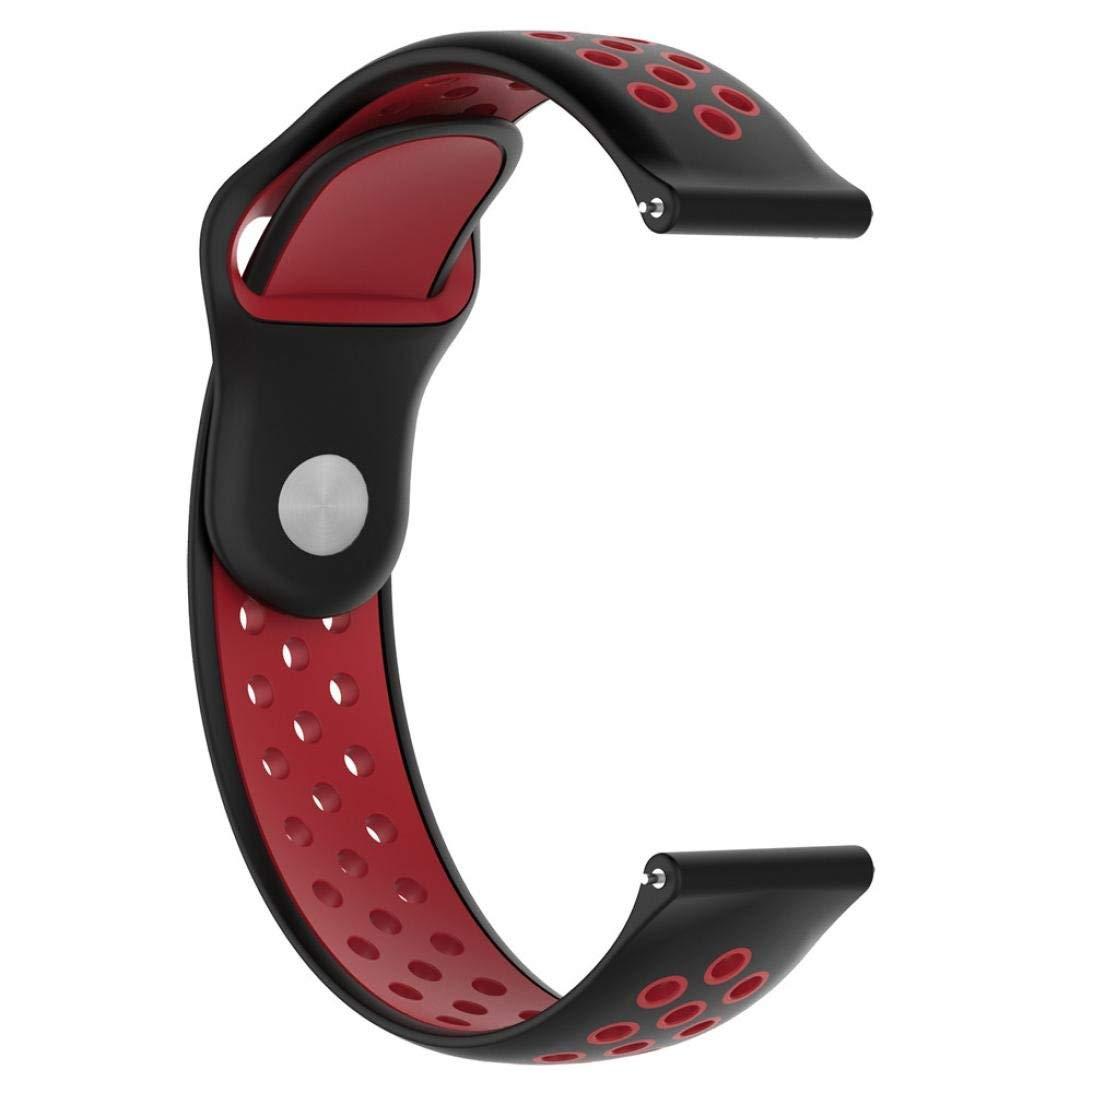 Outsta for Samsung Gear S3 Frontier Watch Band, Replacement Soft Silicagel WatchBand Wrist Strap Accessories Smart Watch Bracelet Band Women Men (D)